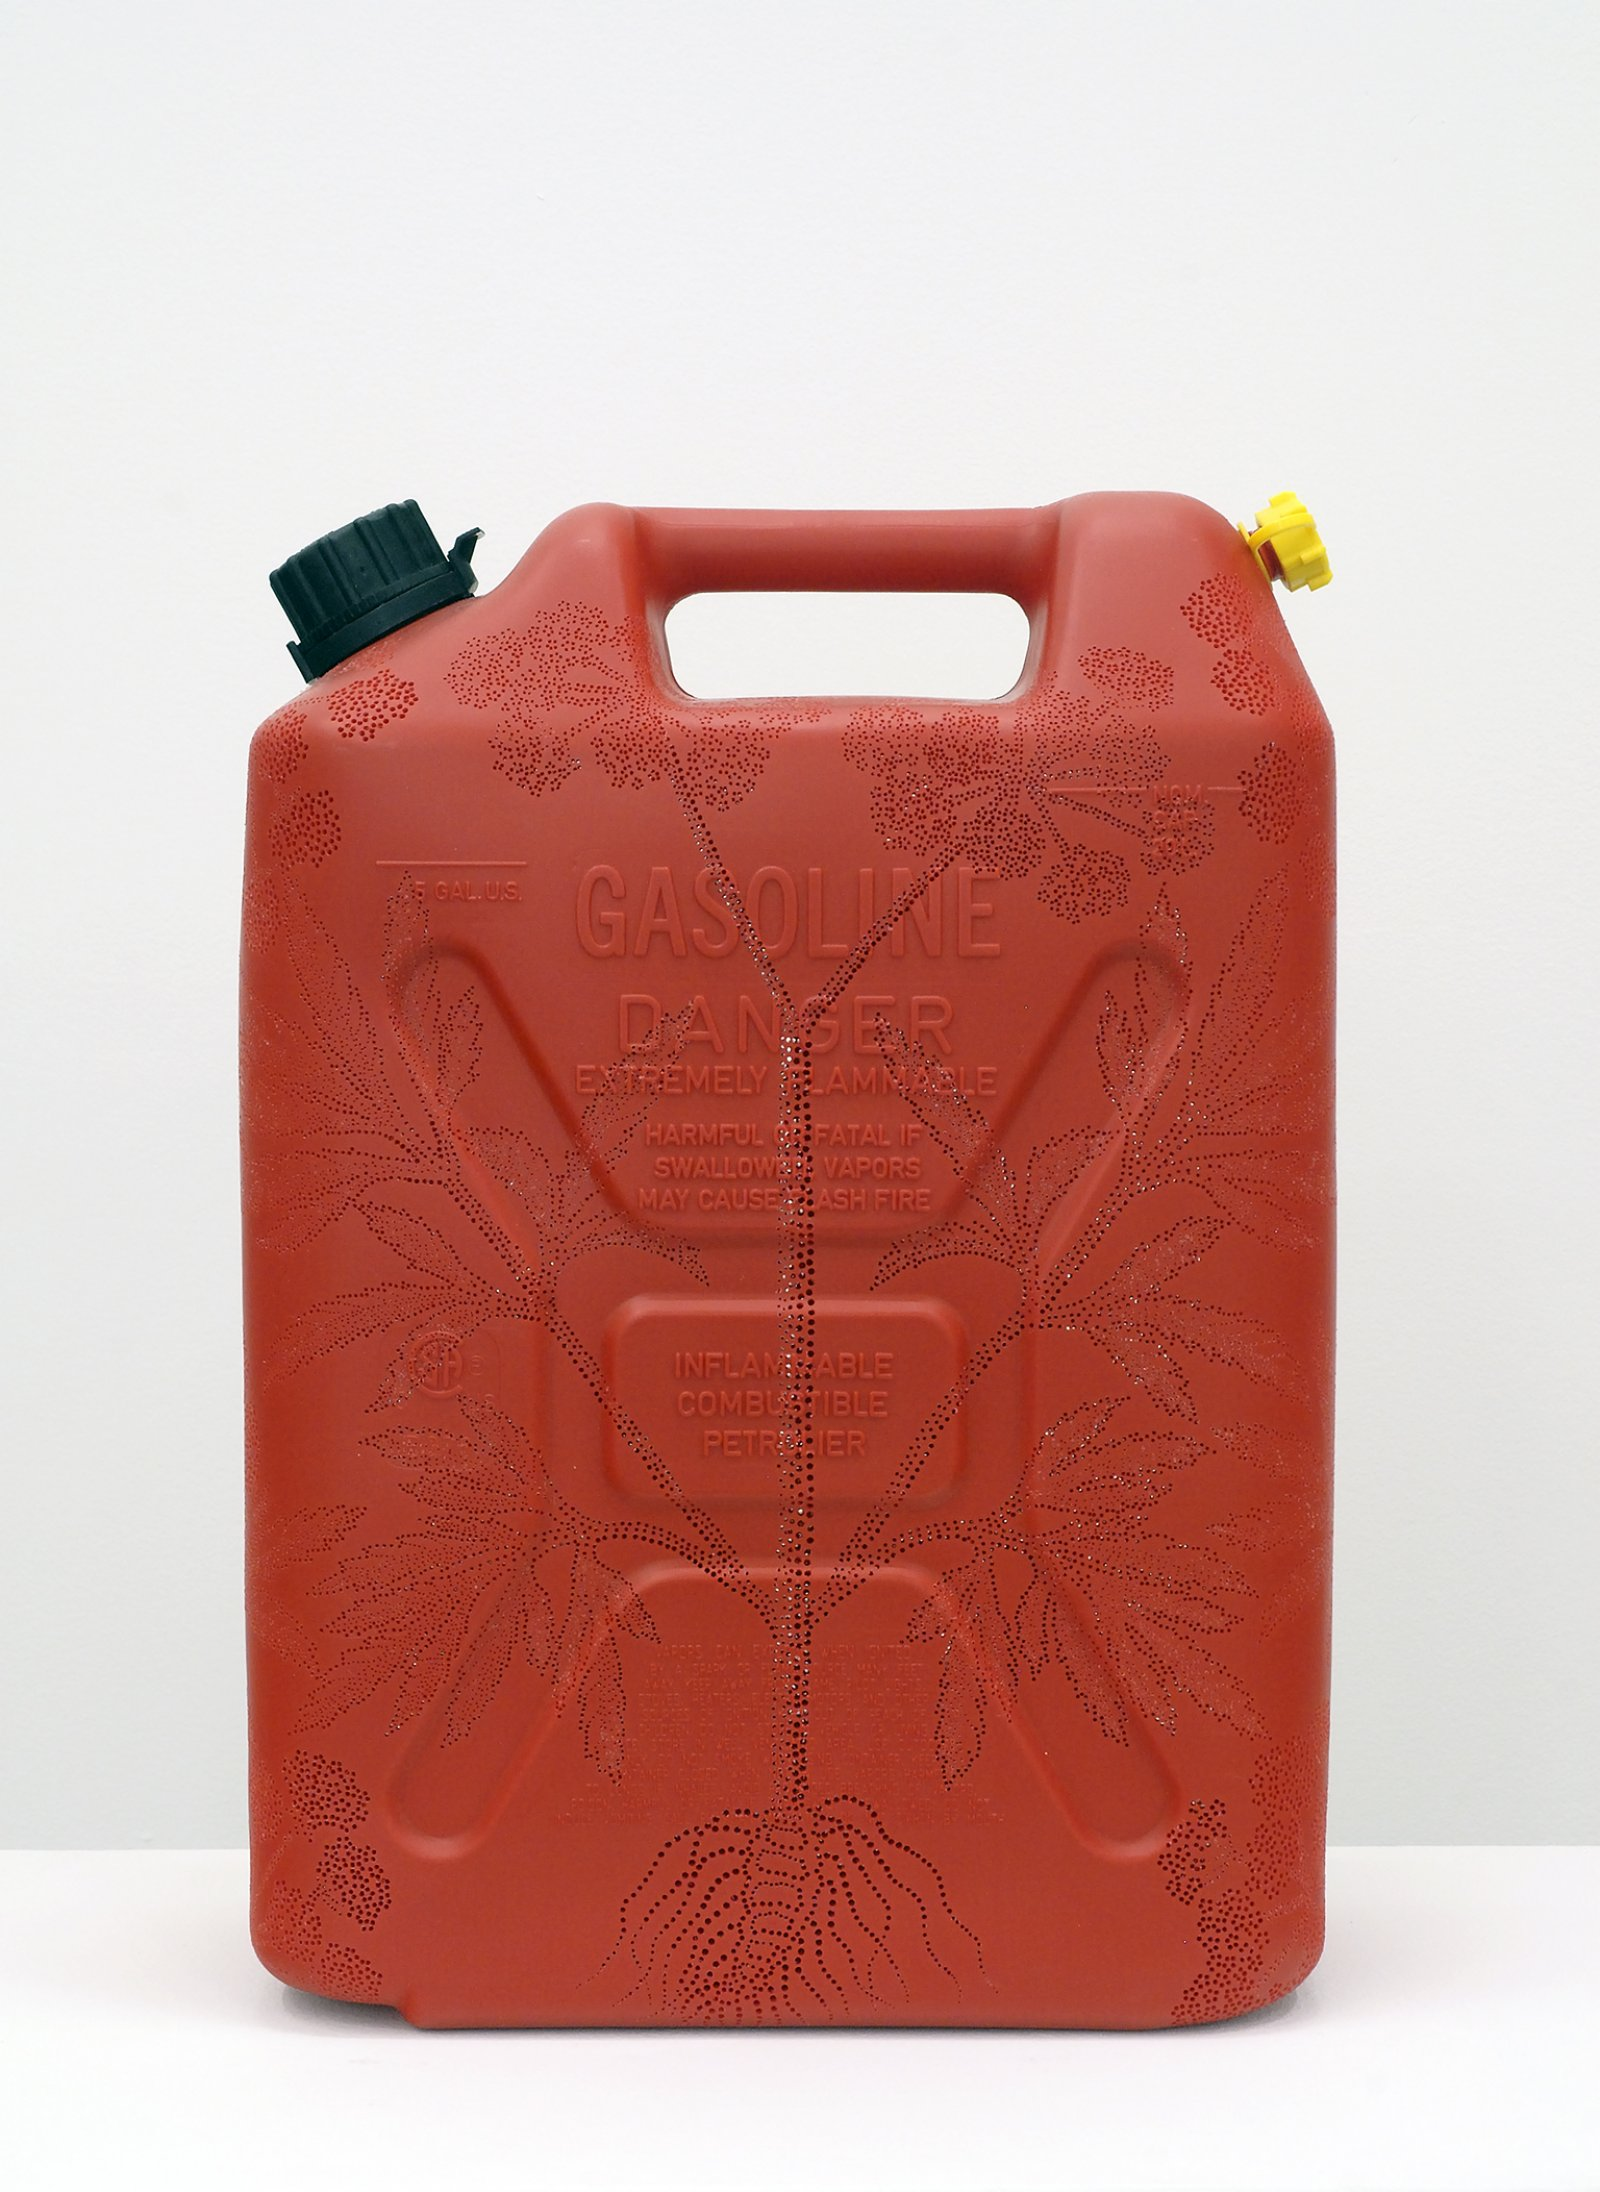 Brian Jungen,Water Hemlock, 2008, carved gallon gasoline jug, 18 x 13 x 7 in. (46 x 33 x 18 cm)